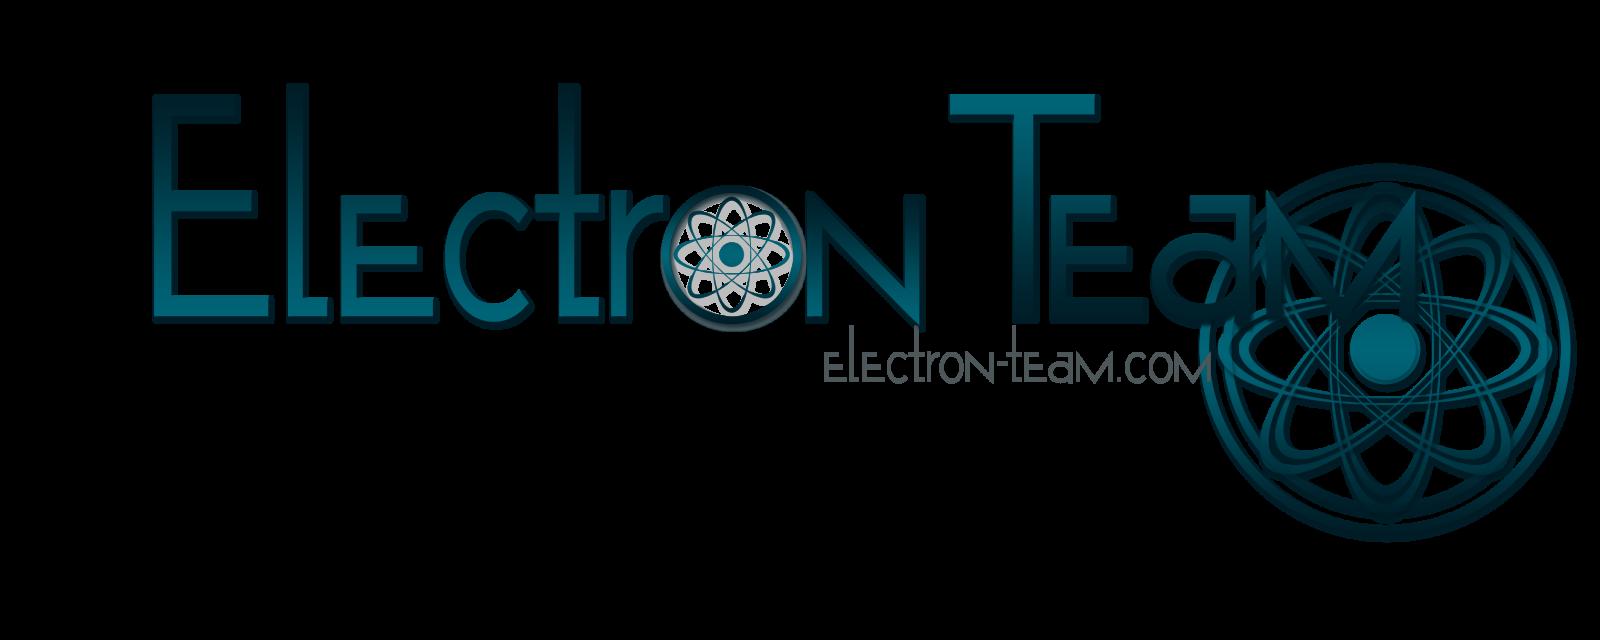 Photo of روم DN5 للنوت 4 تحديث 5.1.1 شبيه بالنوت 5 من ELECTRON TEAM